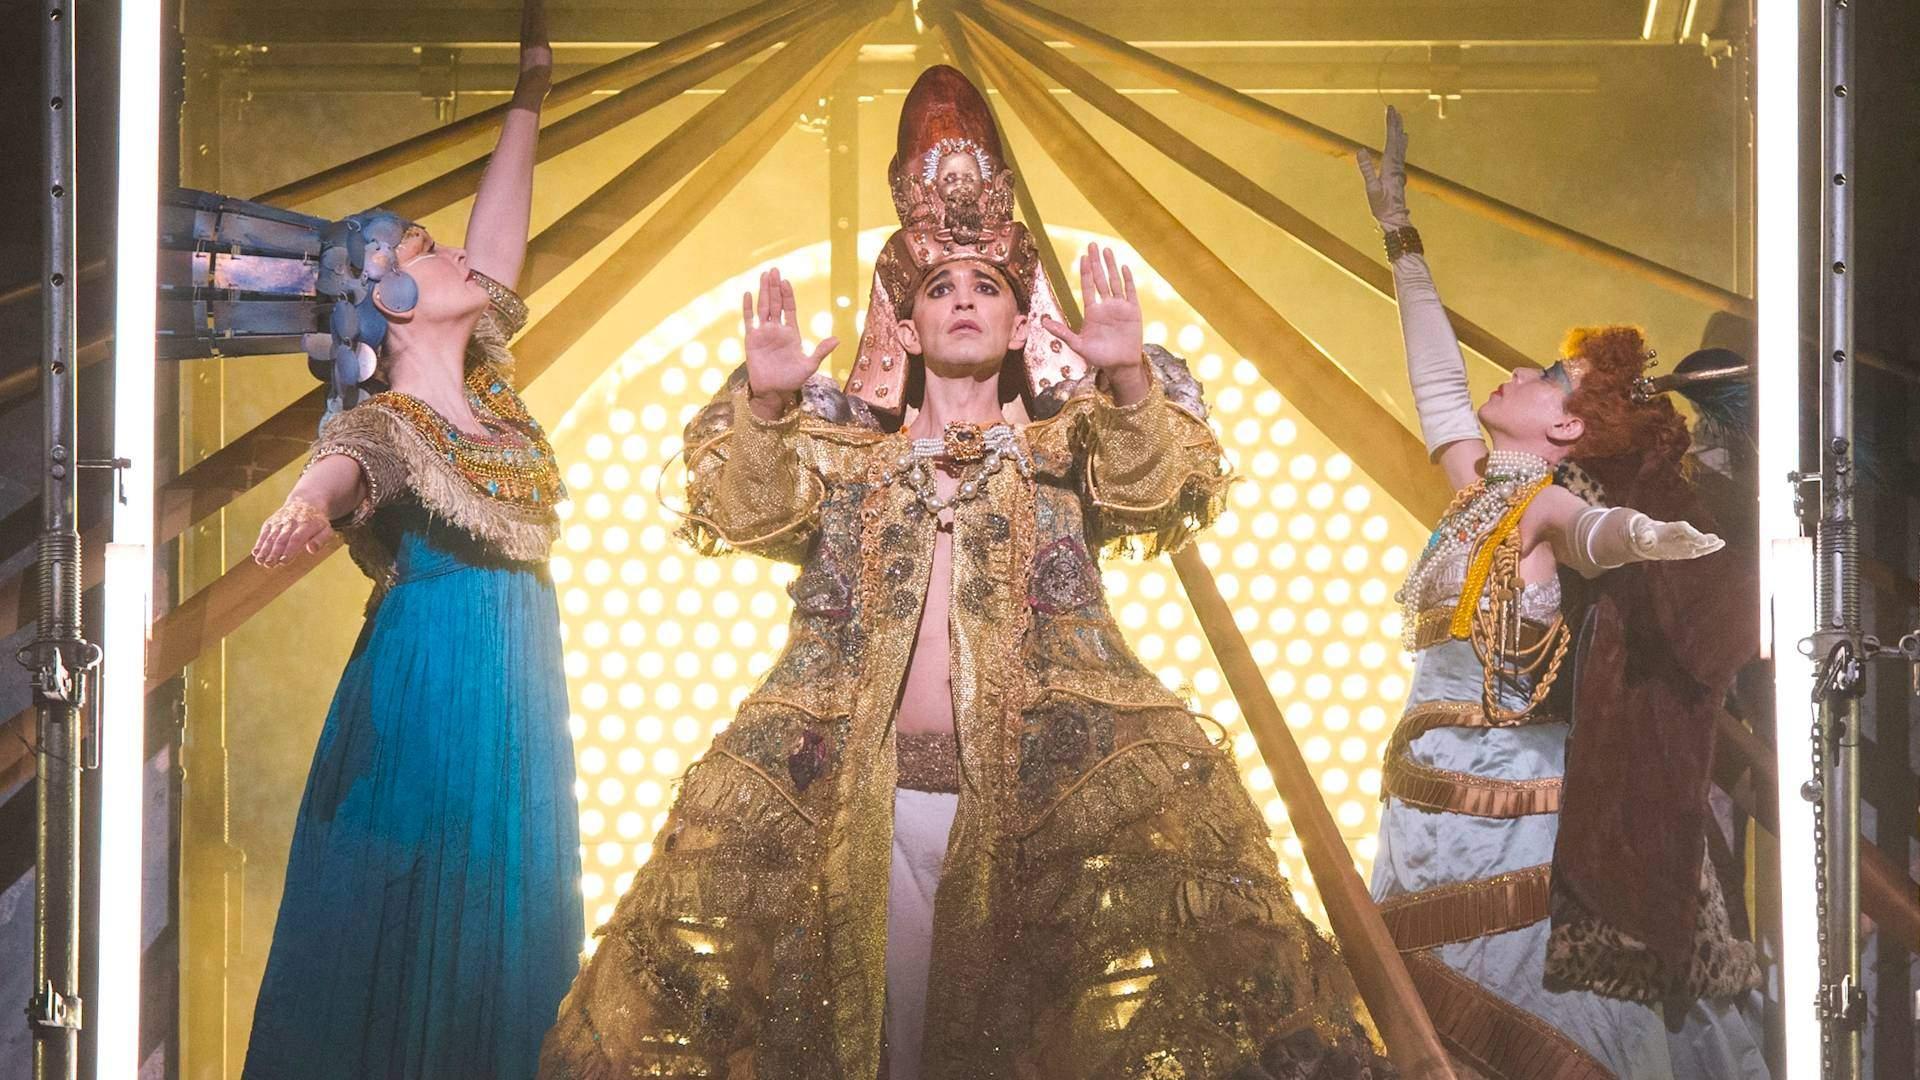 Akhnaten Met Opera 2019 Featurette One News Page Video